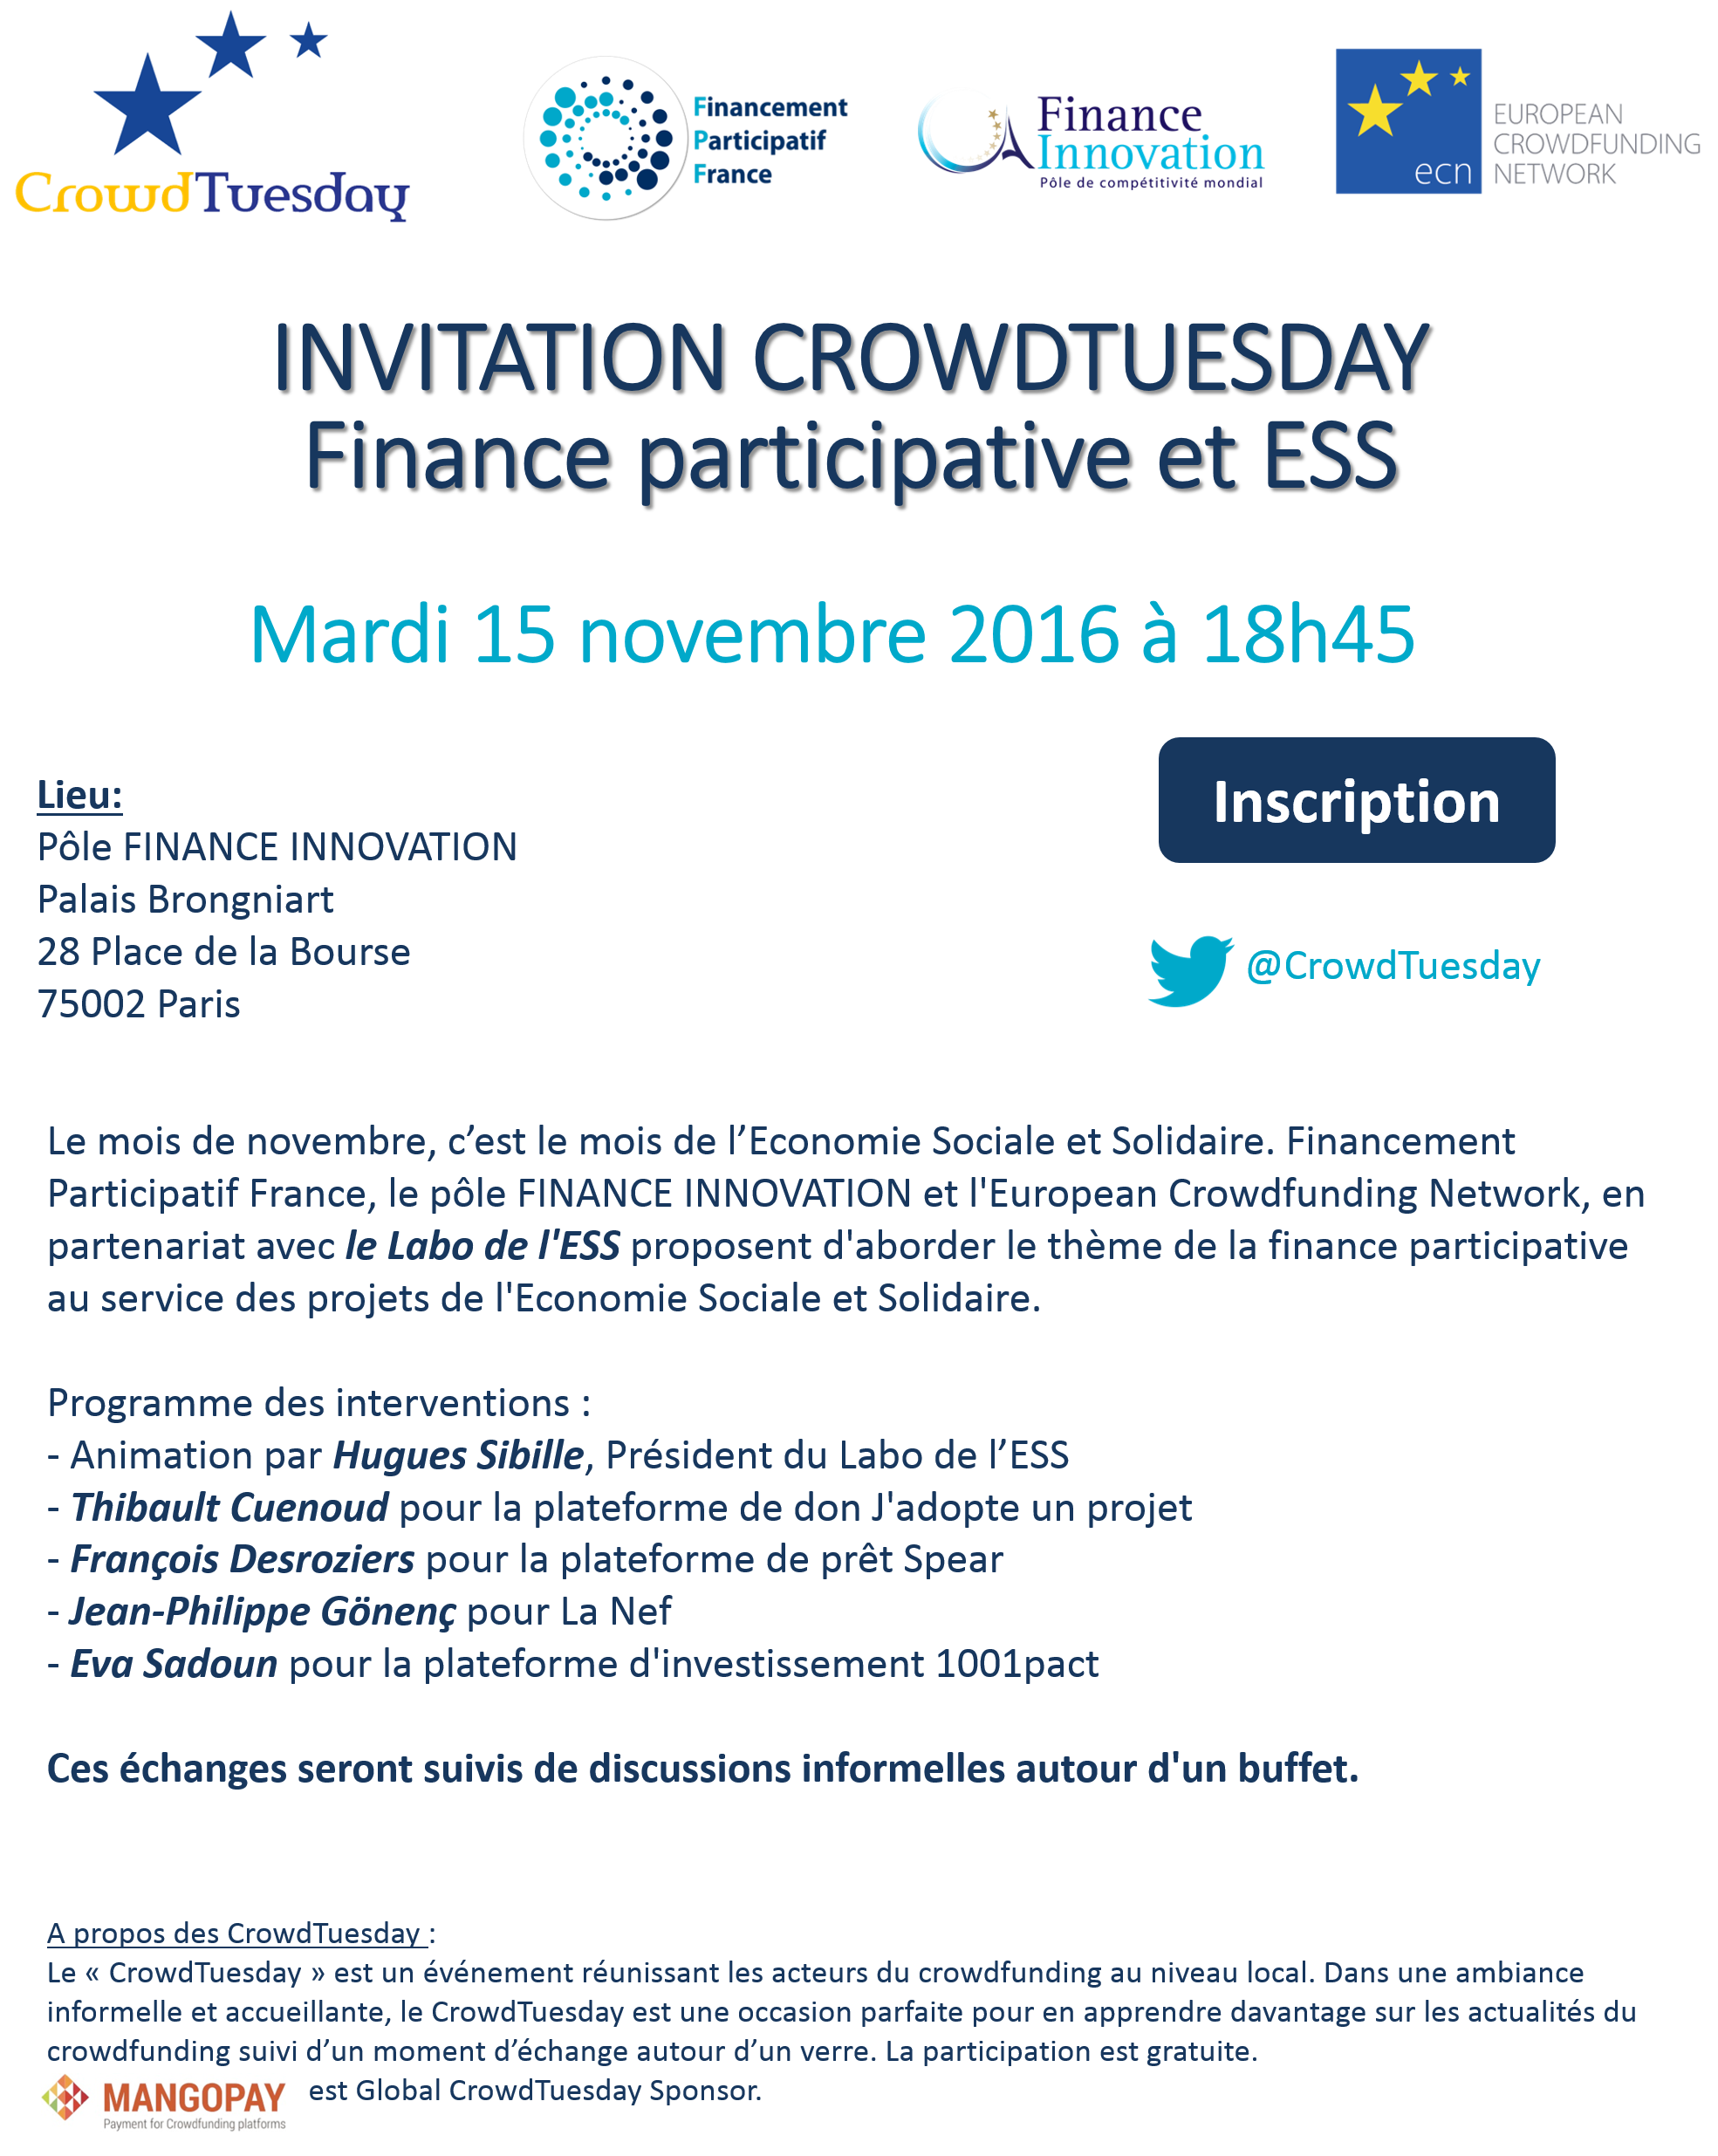 invitation-crowdtuesday-ess_2016-11-15